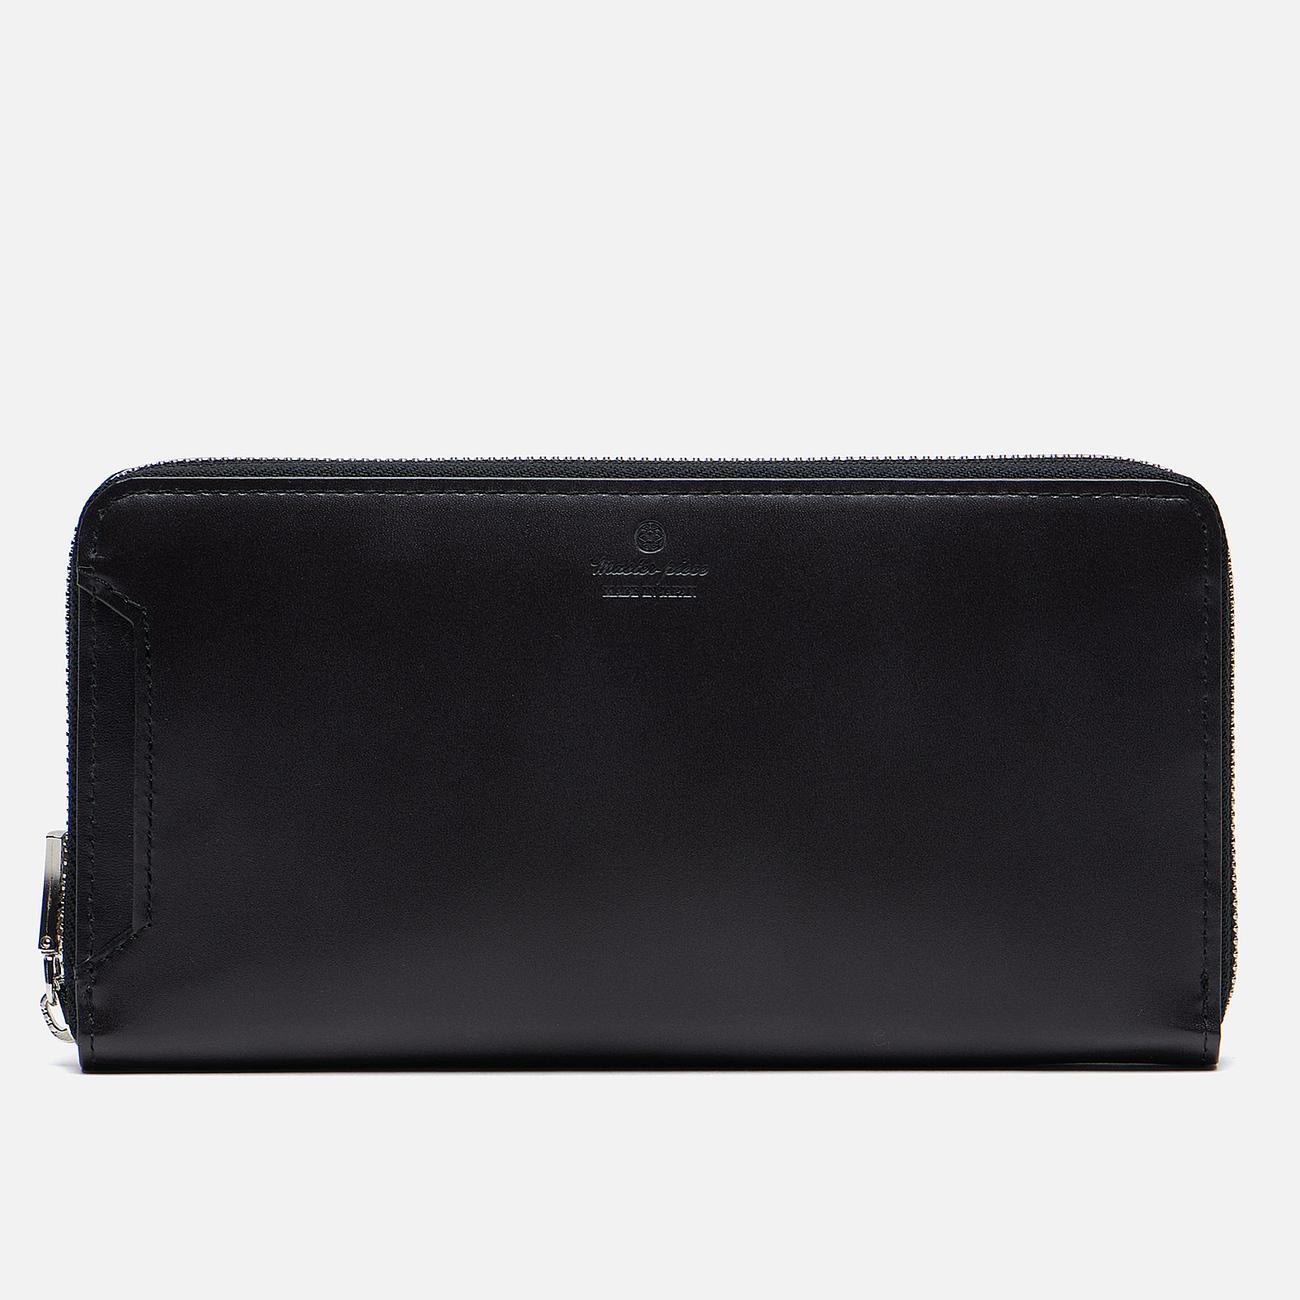 Кошелек Master-piece Folder Goods Large Black